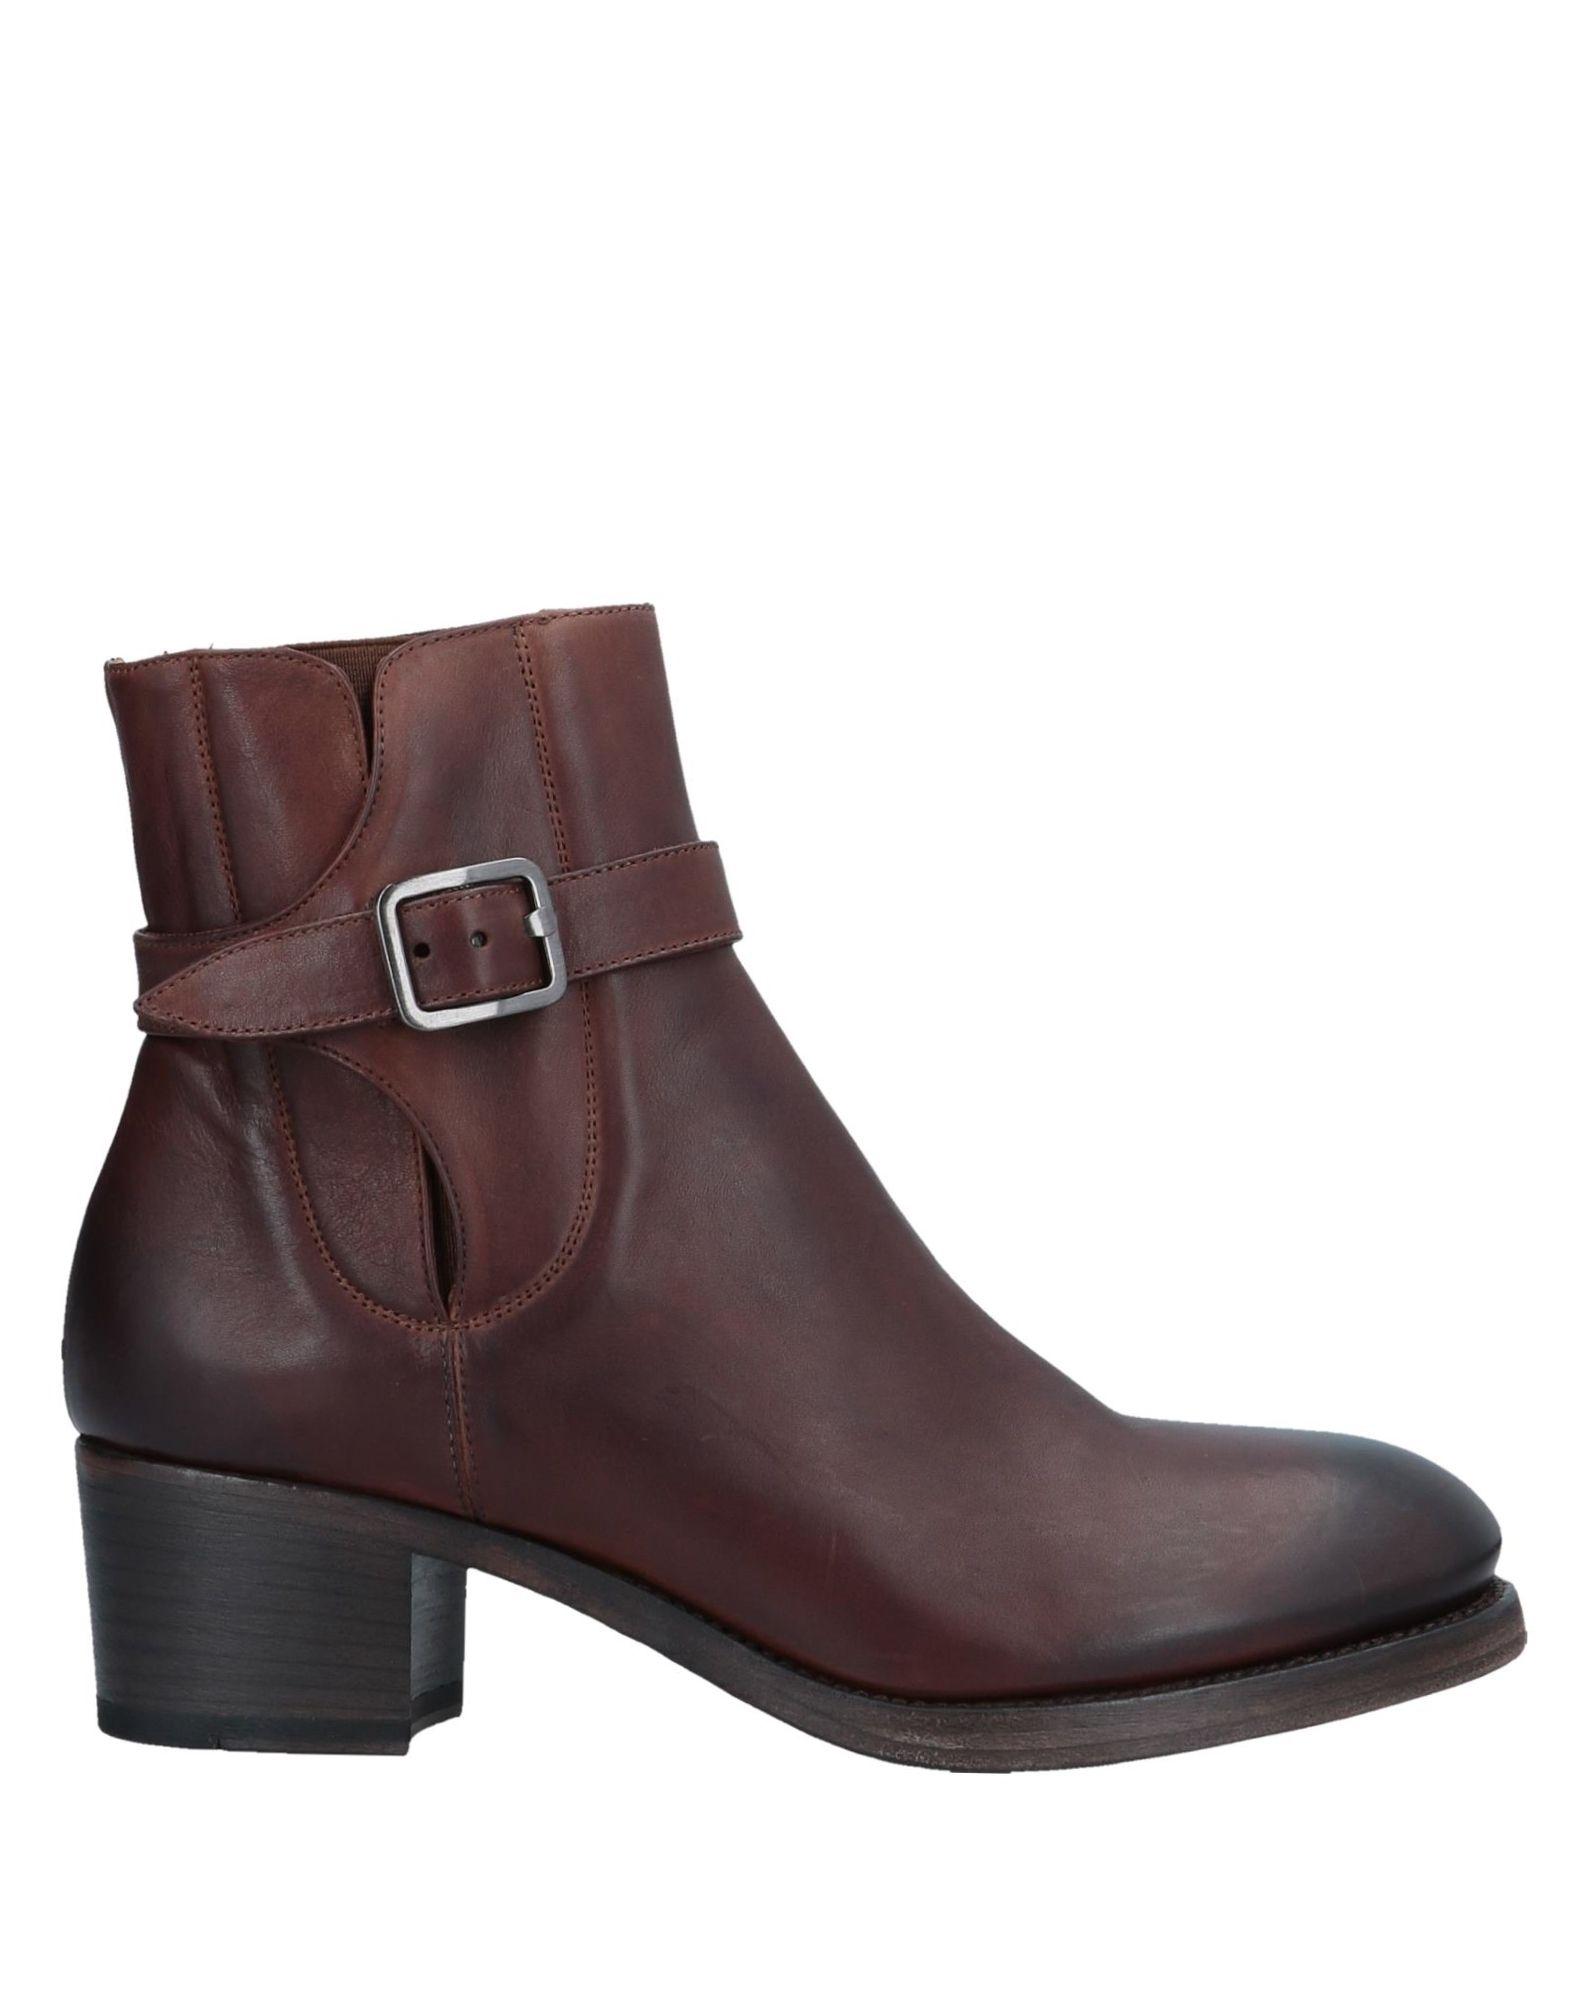 Pantanetti Pantanetti Ankle Boot - Women Pantanetti Pantanetti Ankle Boots online on  Australia - 11557713MA f7998a